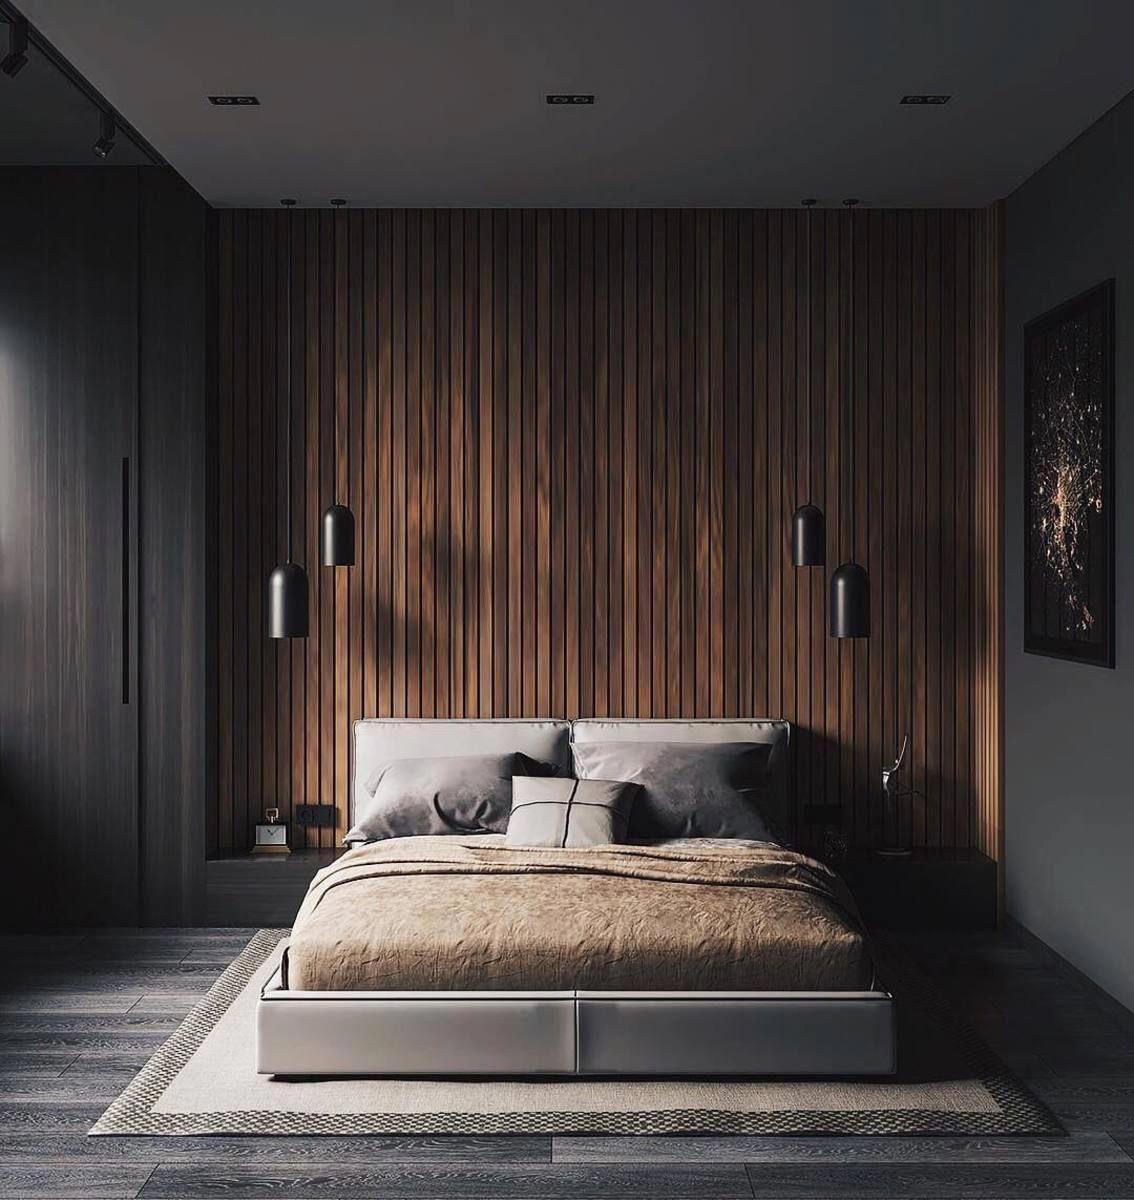 Minimal Interior Design Inspiration 171 Luxurious Bedrooms Modern Luxury Bedroom Interior Design Bedroom Elegant minimalist luxury room